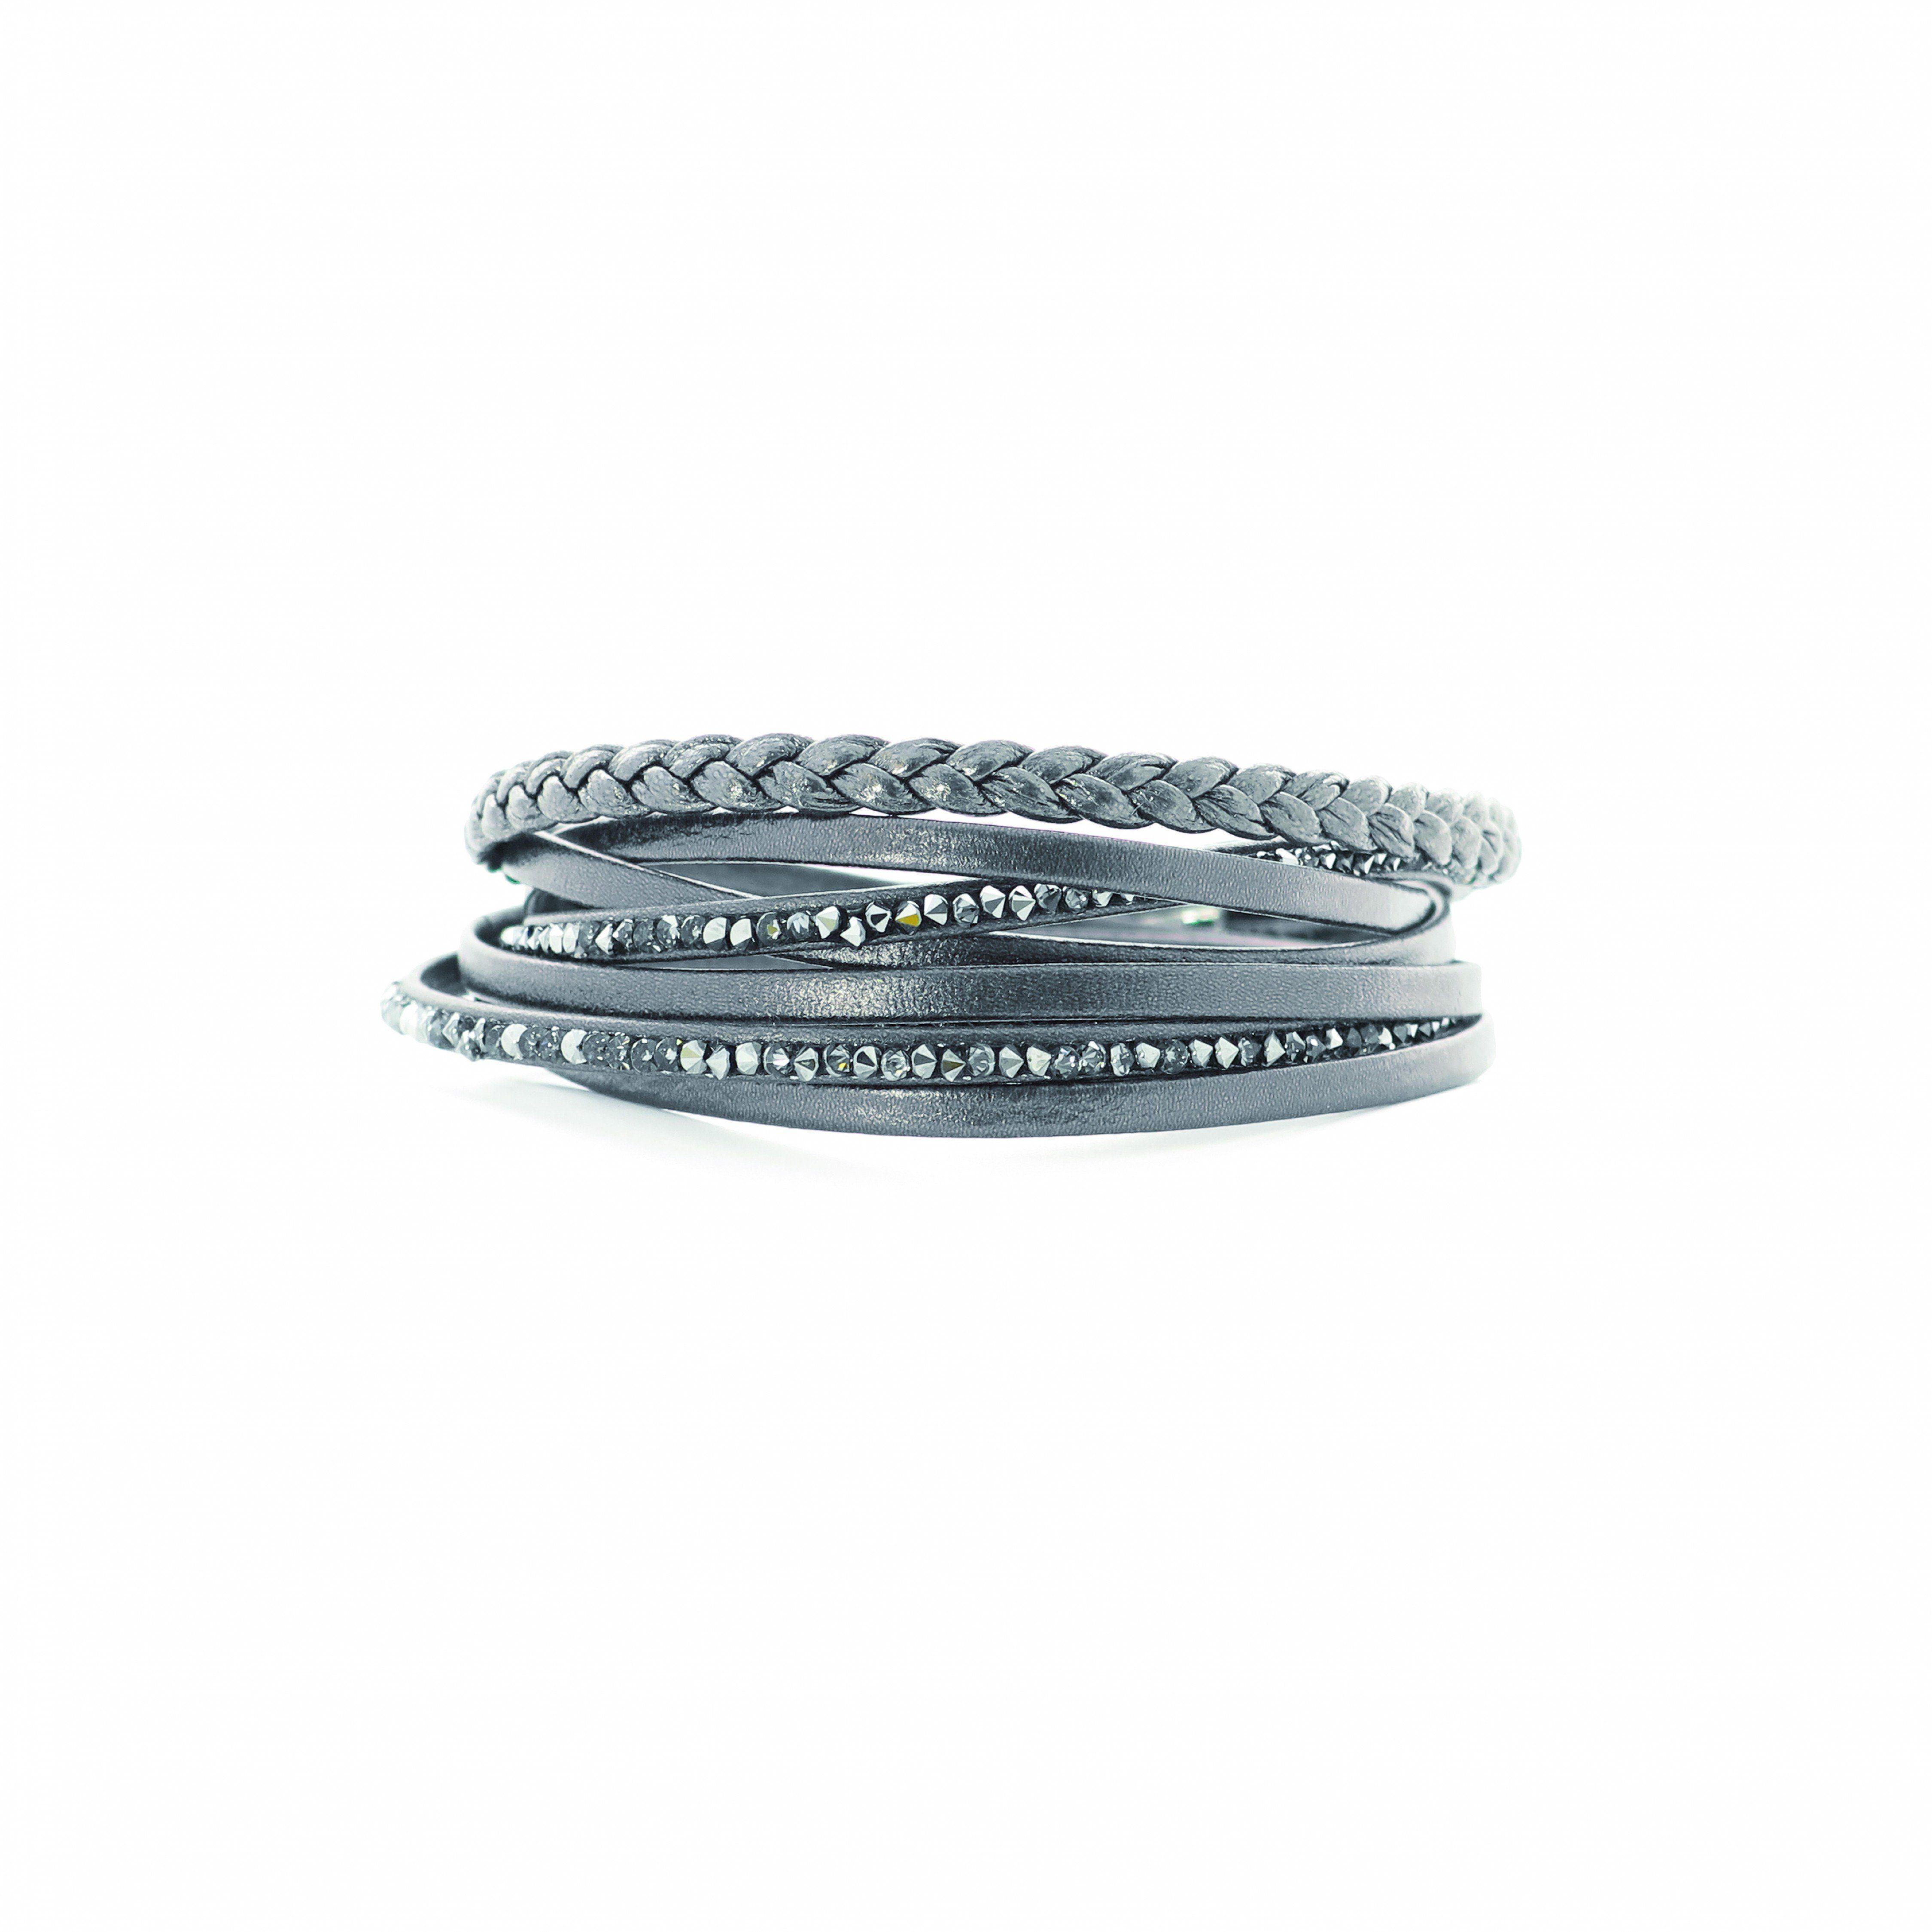 LOVING CRYSTAL Lederarmband Damenmode/Schmuck & Accessoires/Schmuck/Armbänder/Lederarmbänder